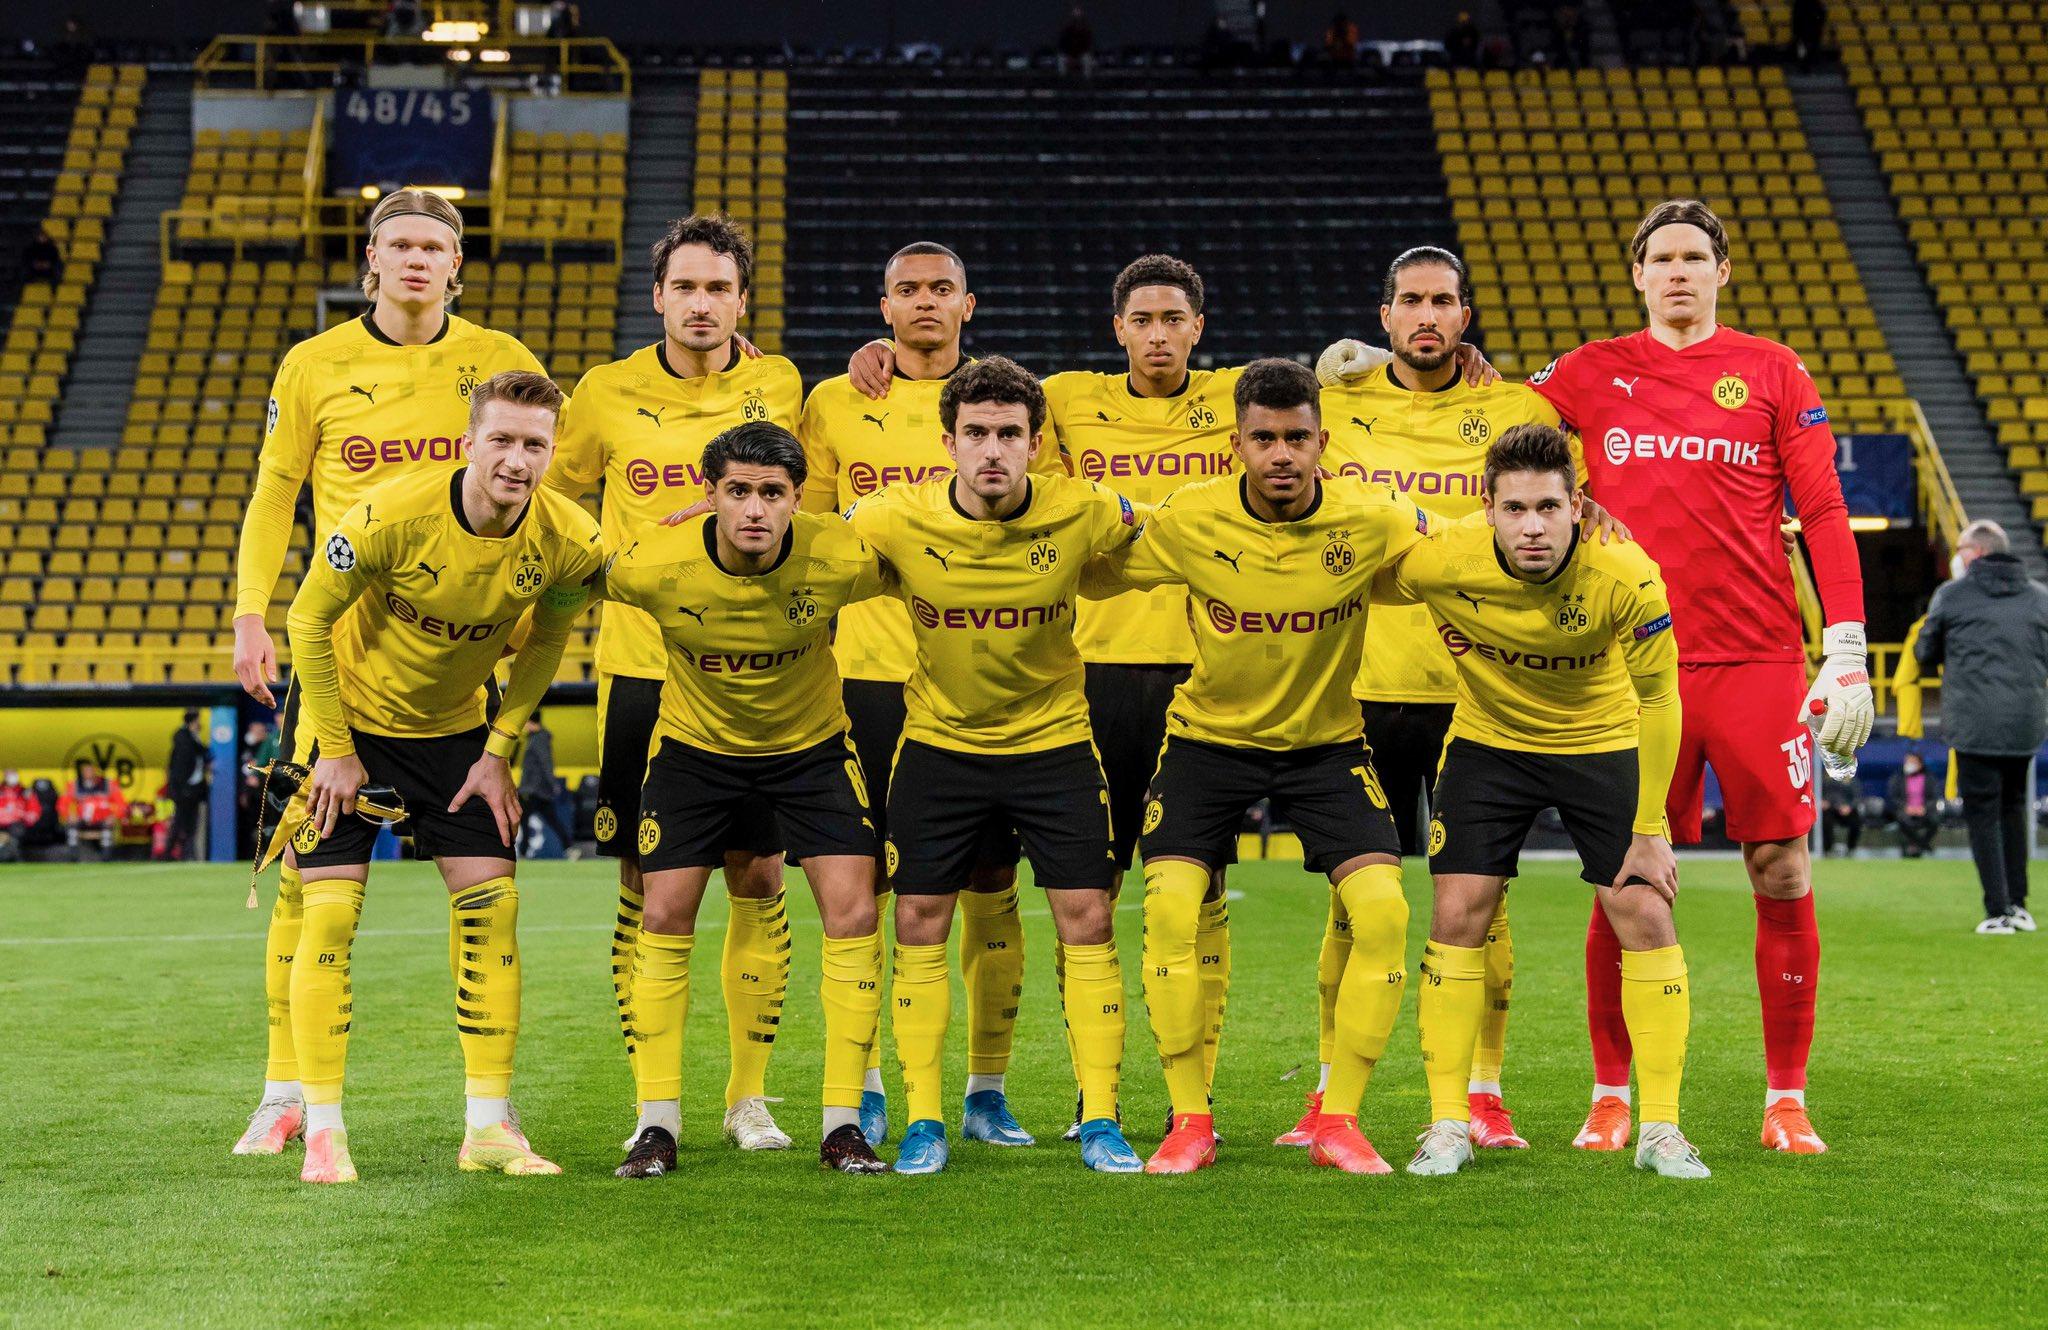 Borussia Dortmund On Twitter Borussia Dortmund